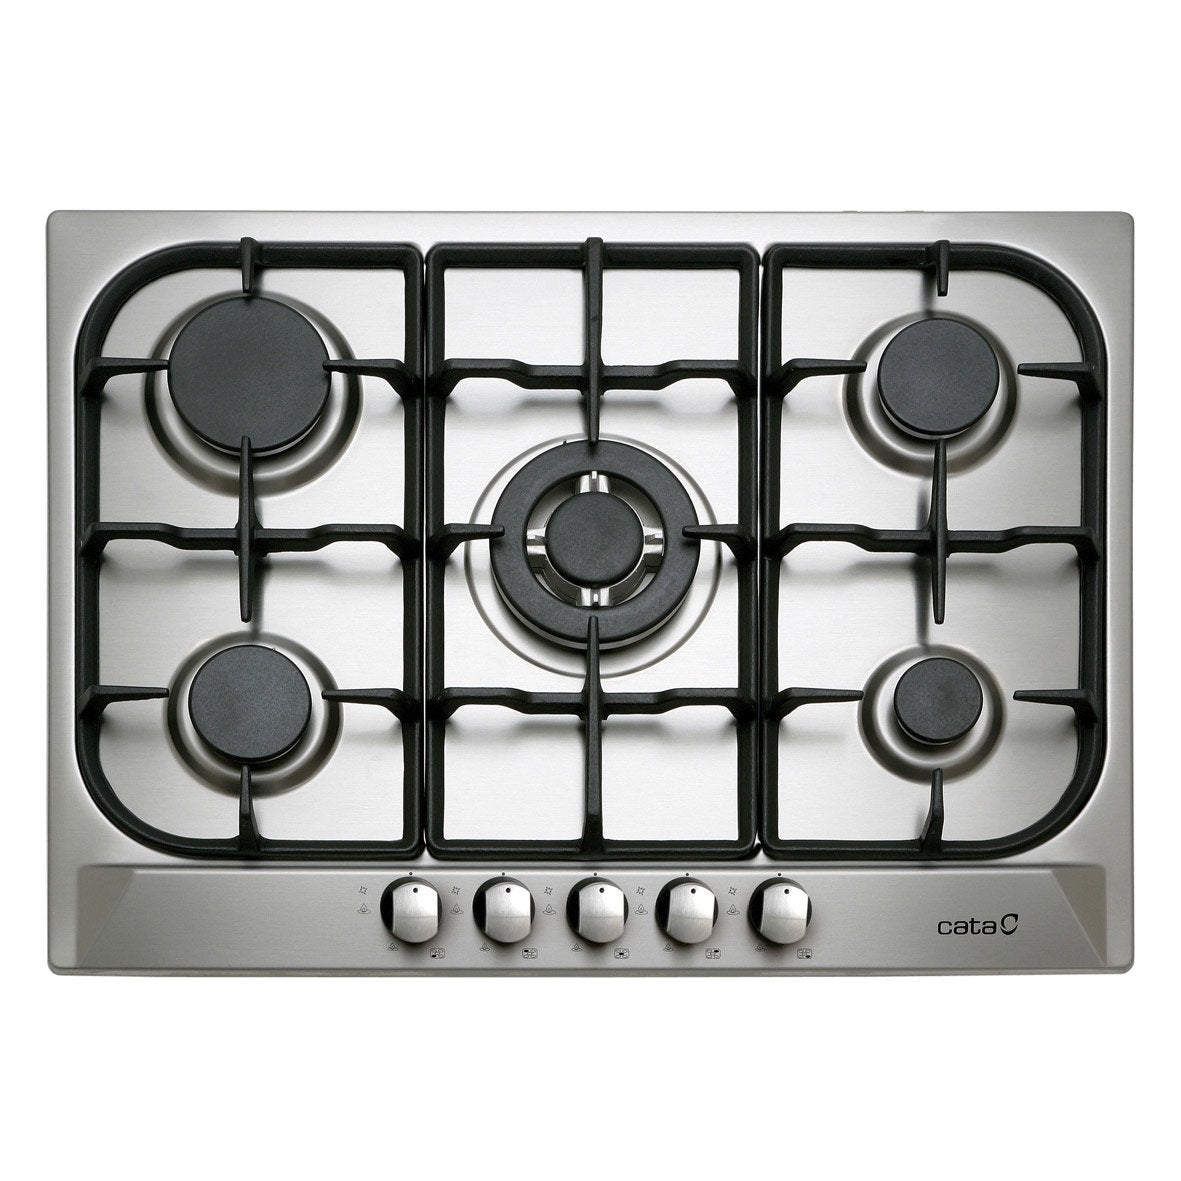 plaque de cuisson gaz 5 foyers inox cata apelson l705ti. Black Bedroom Furniture Sets. Home Design Ideas